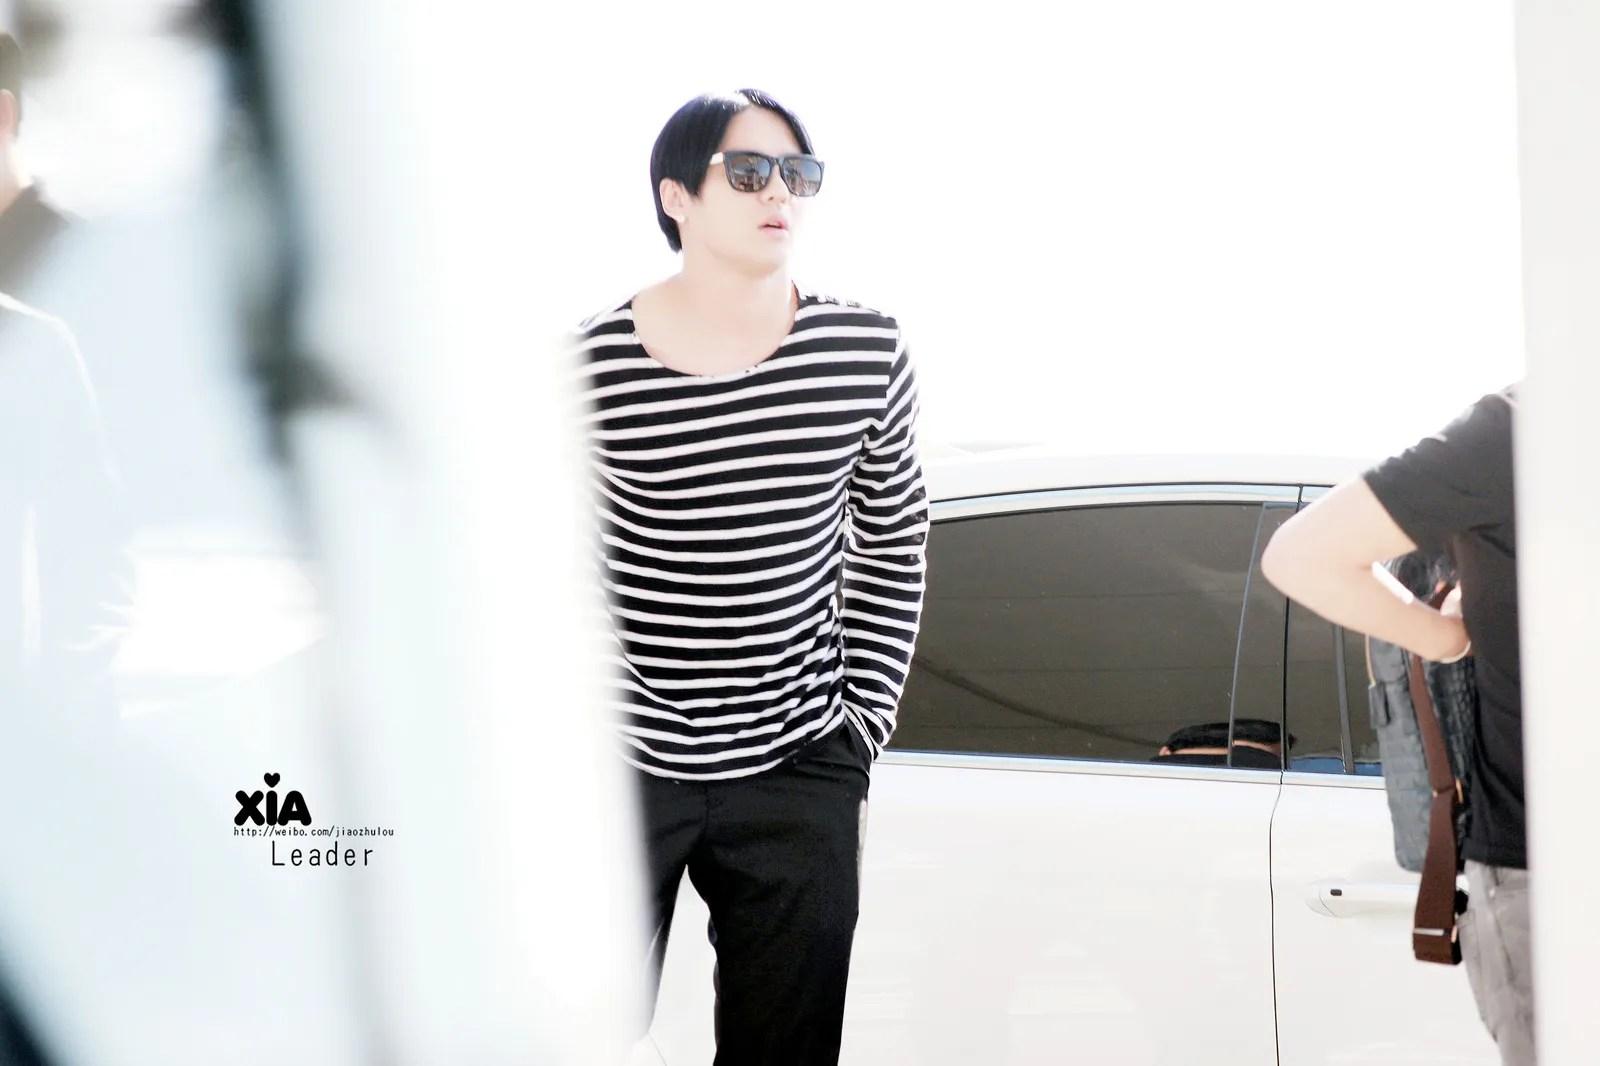 photo Xia_Leader_01.jpg